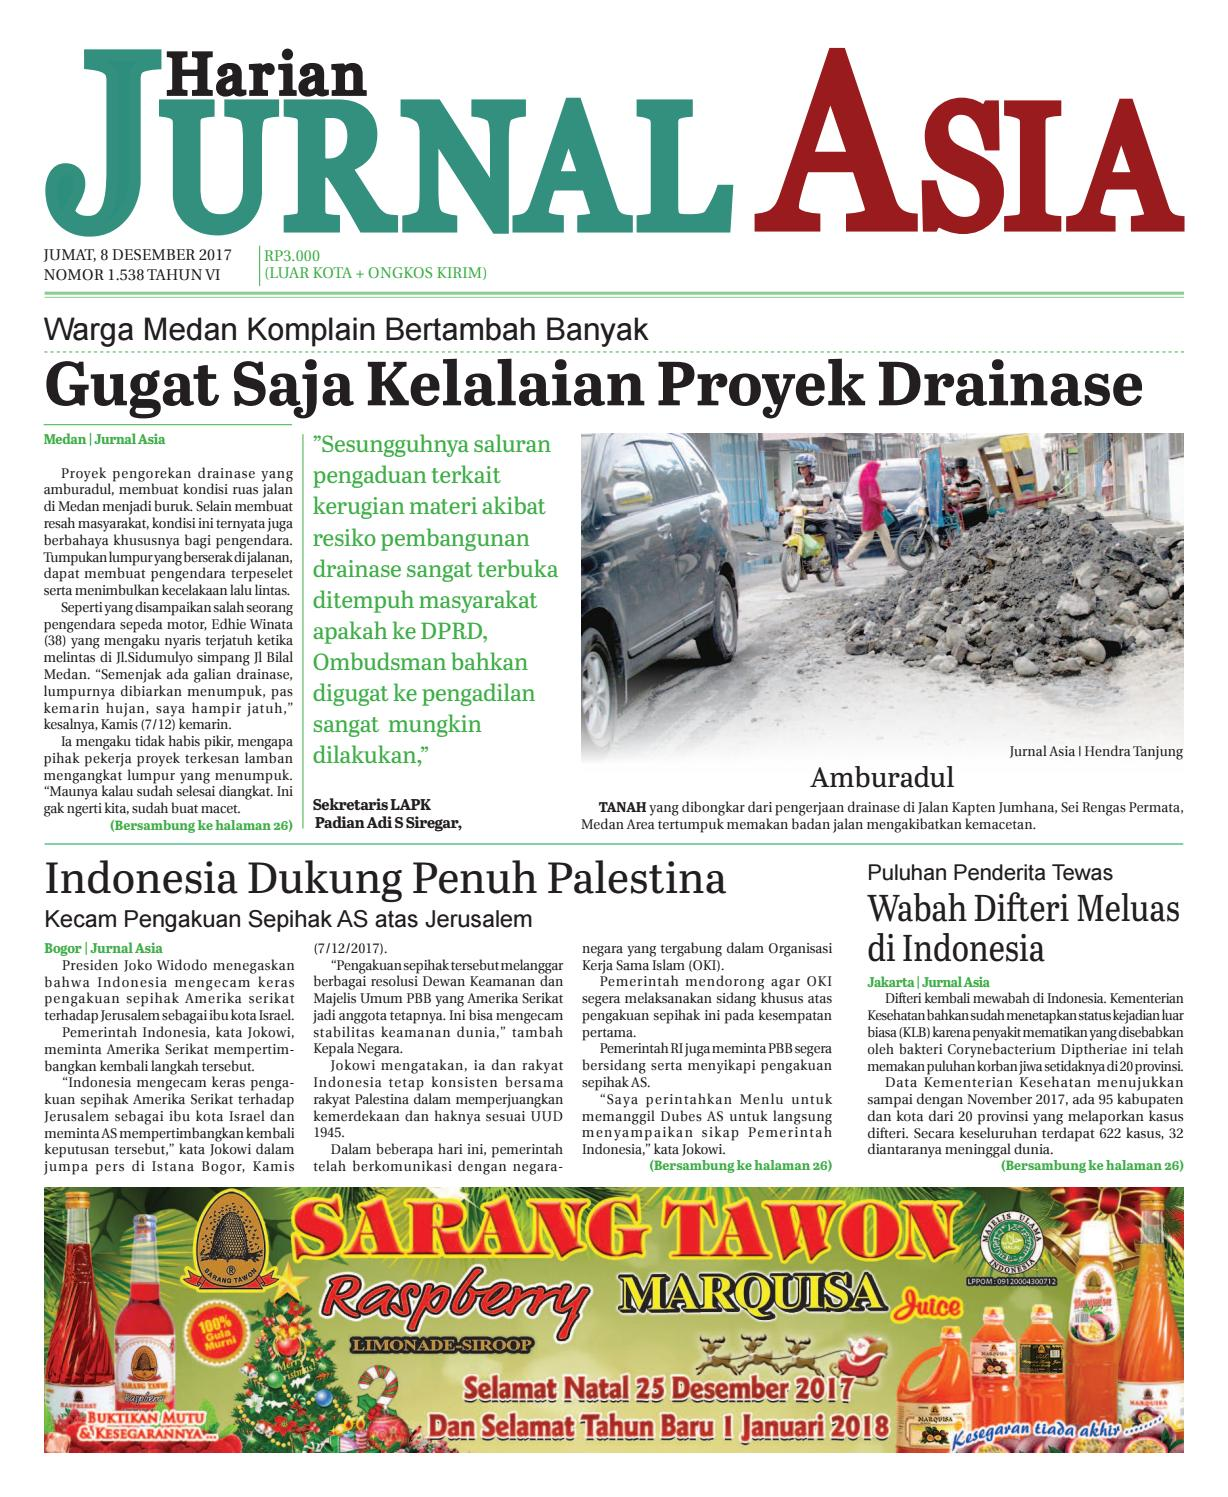 Harian Jurnal Asia Edisi Jumat 08 Desember 2017 By Harian Jurnal